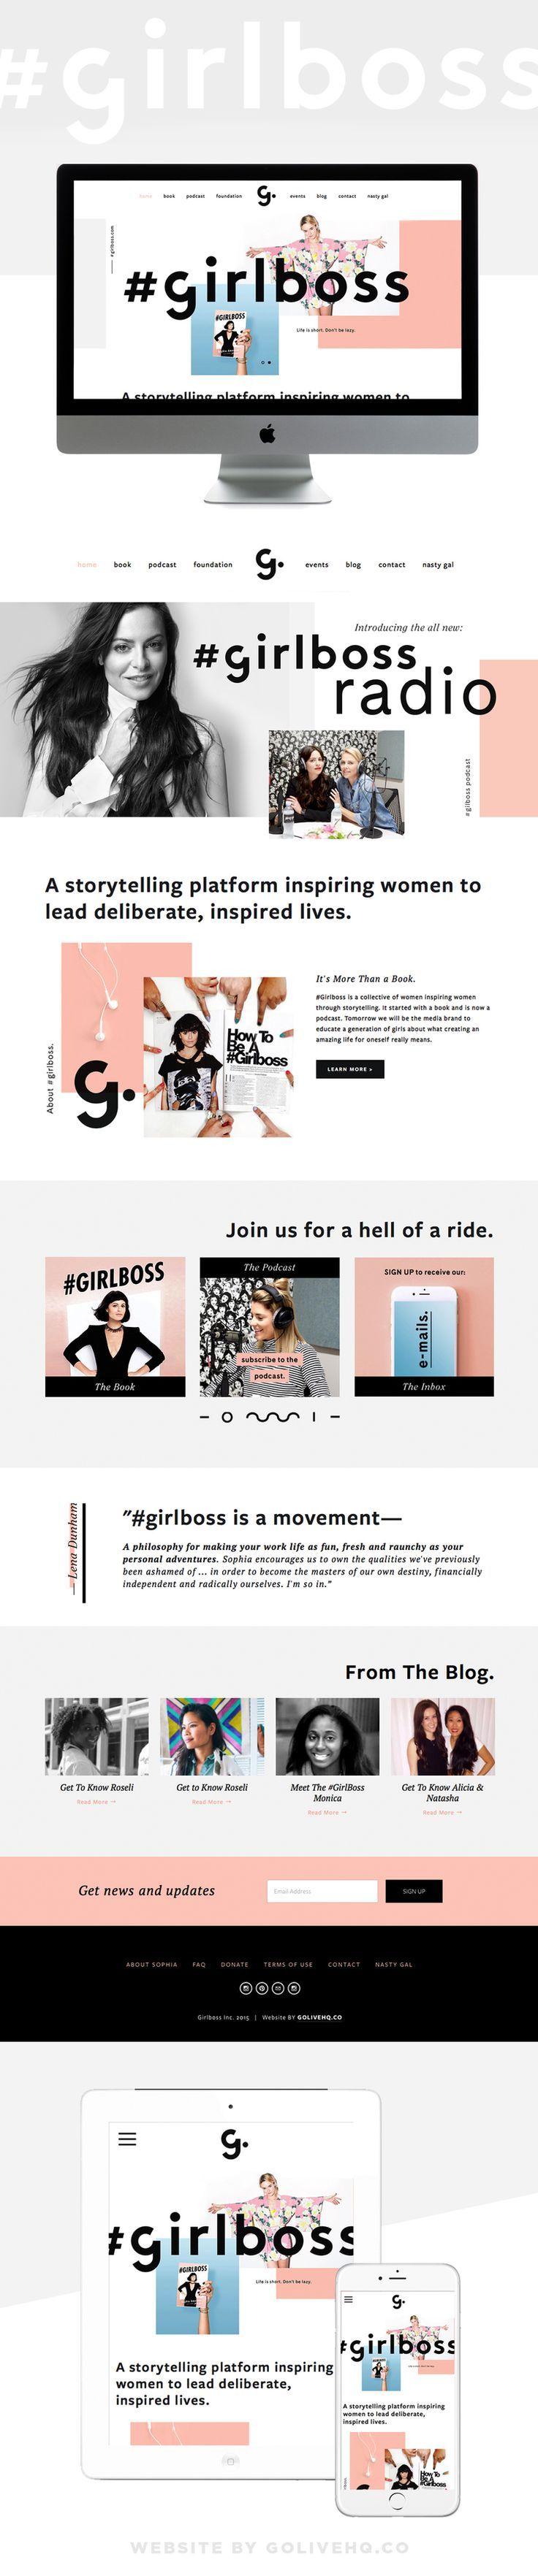 www.girlboss.com   by golivehq.co